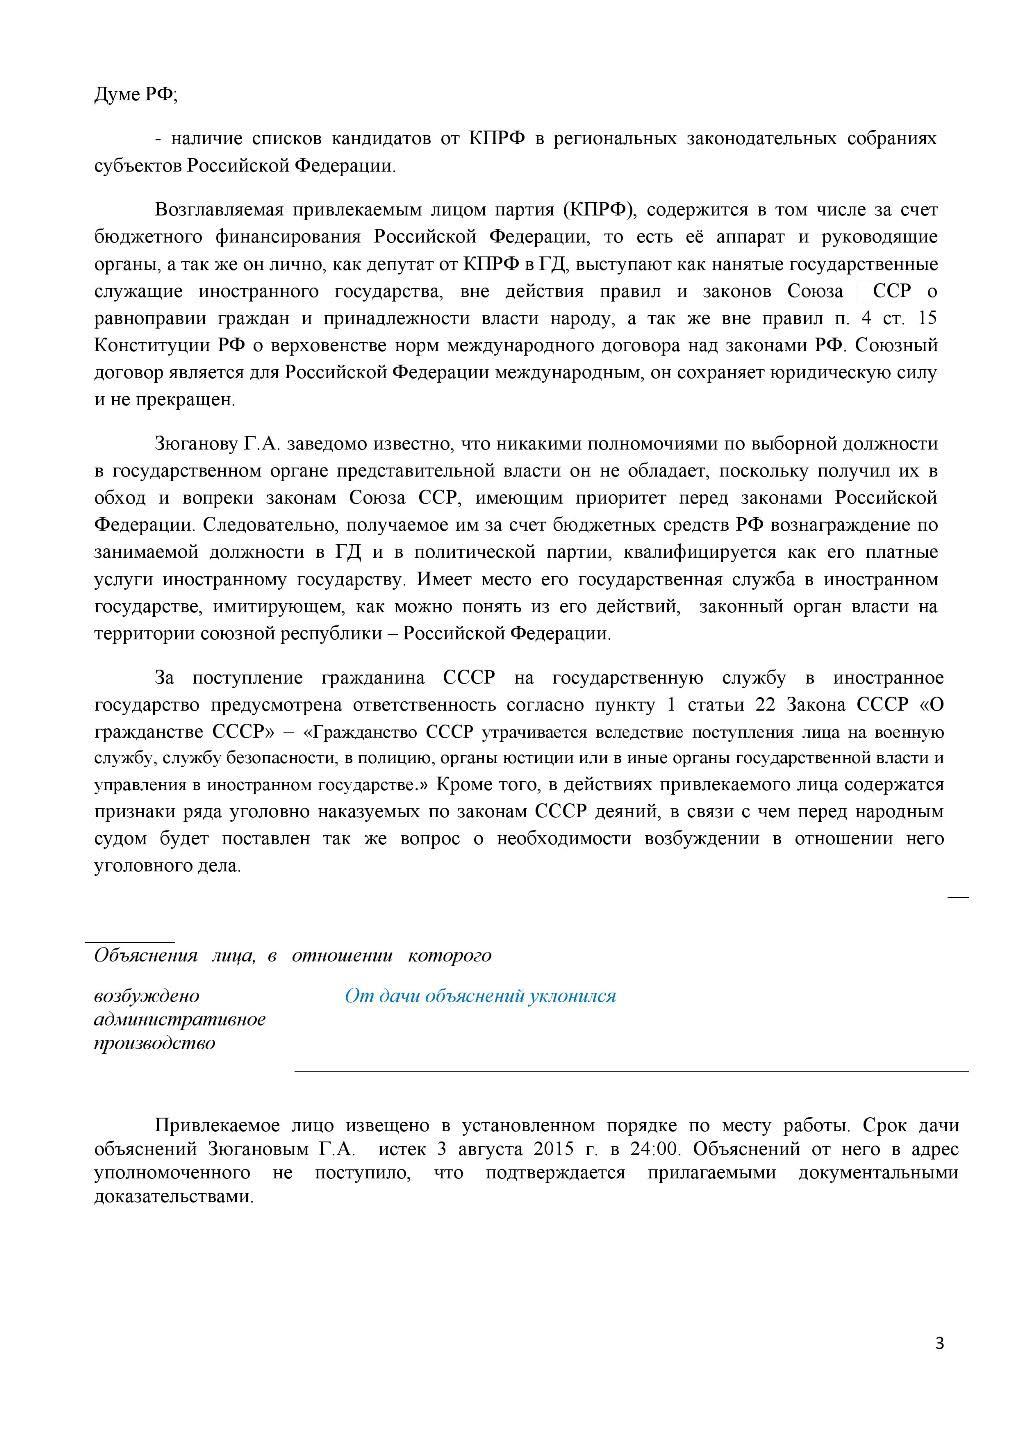 http://narsud-sssr.ru/wp-content/uploads/2015/08/page3.jpg